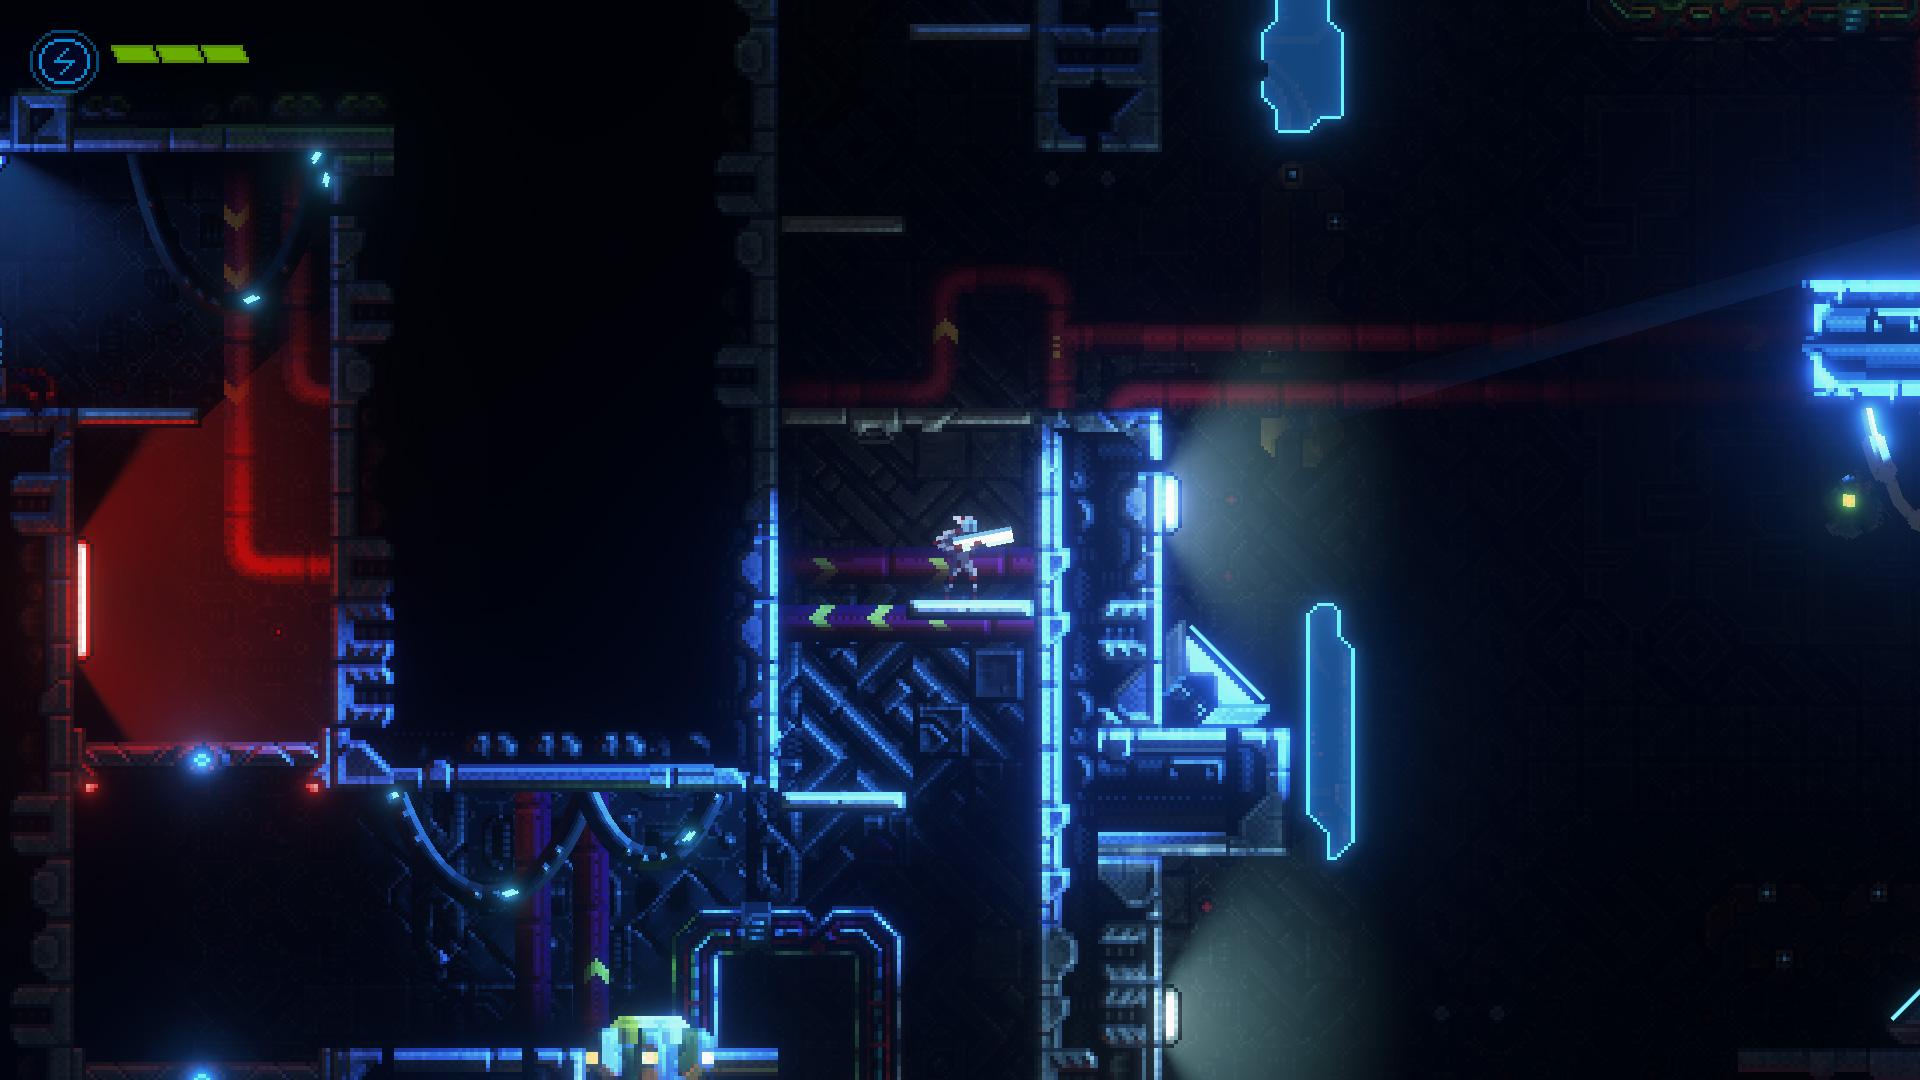 8-Bit的皮,外加接近真实的光影表现,伴随着细节丰富的场景设计,就问你想不想截图?